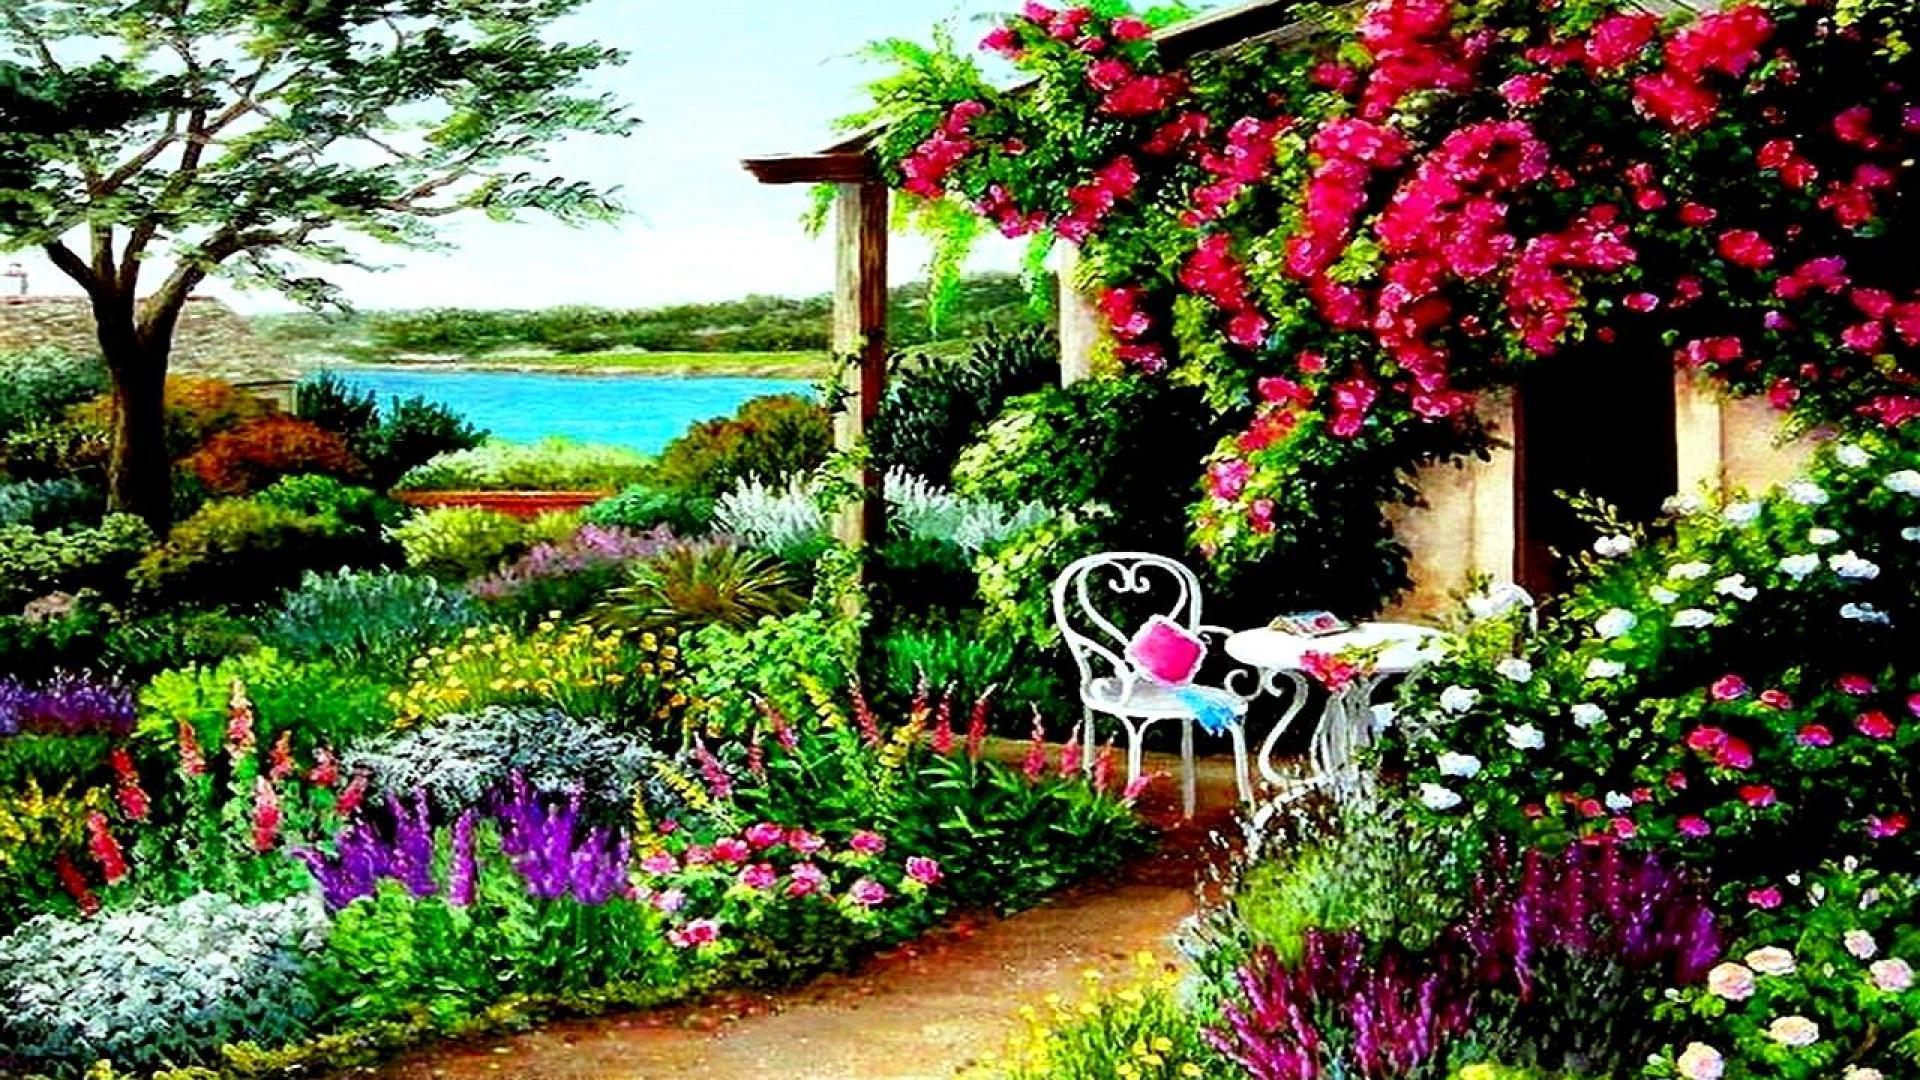 Flower garden wallpaper background - Awesome Spring Garden High Quality Wallpaper For Desktop Background